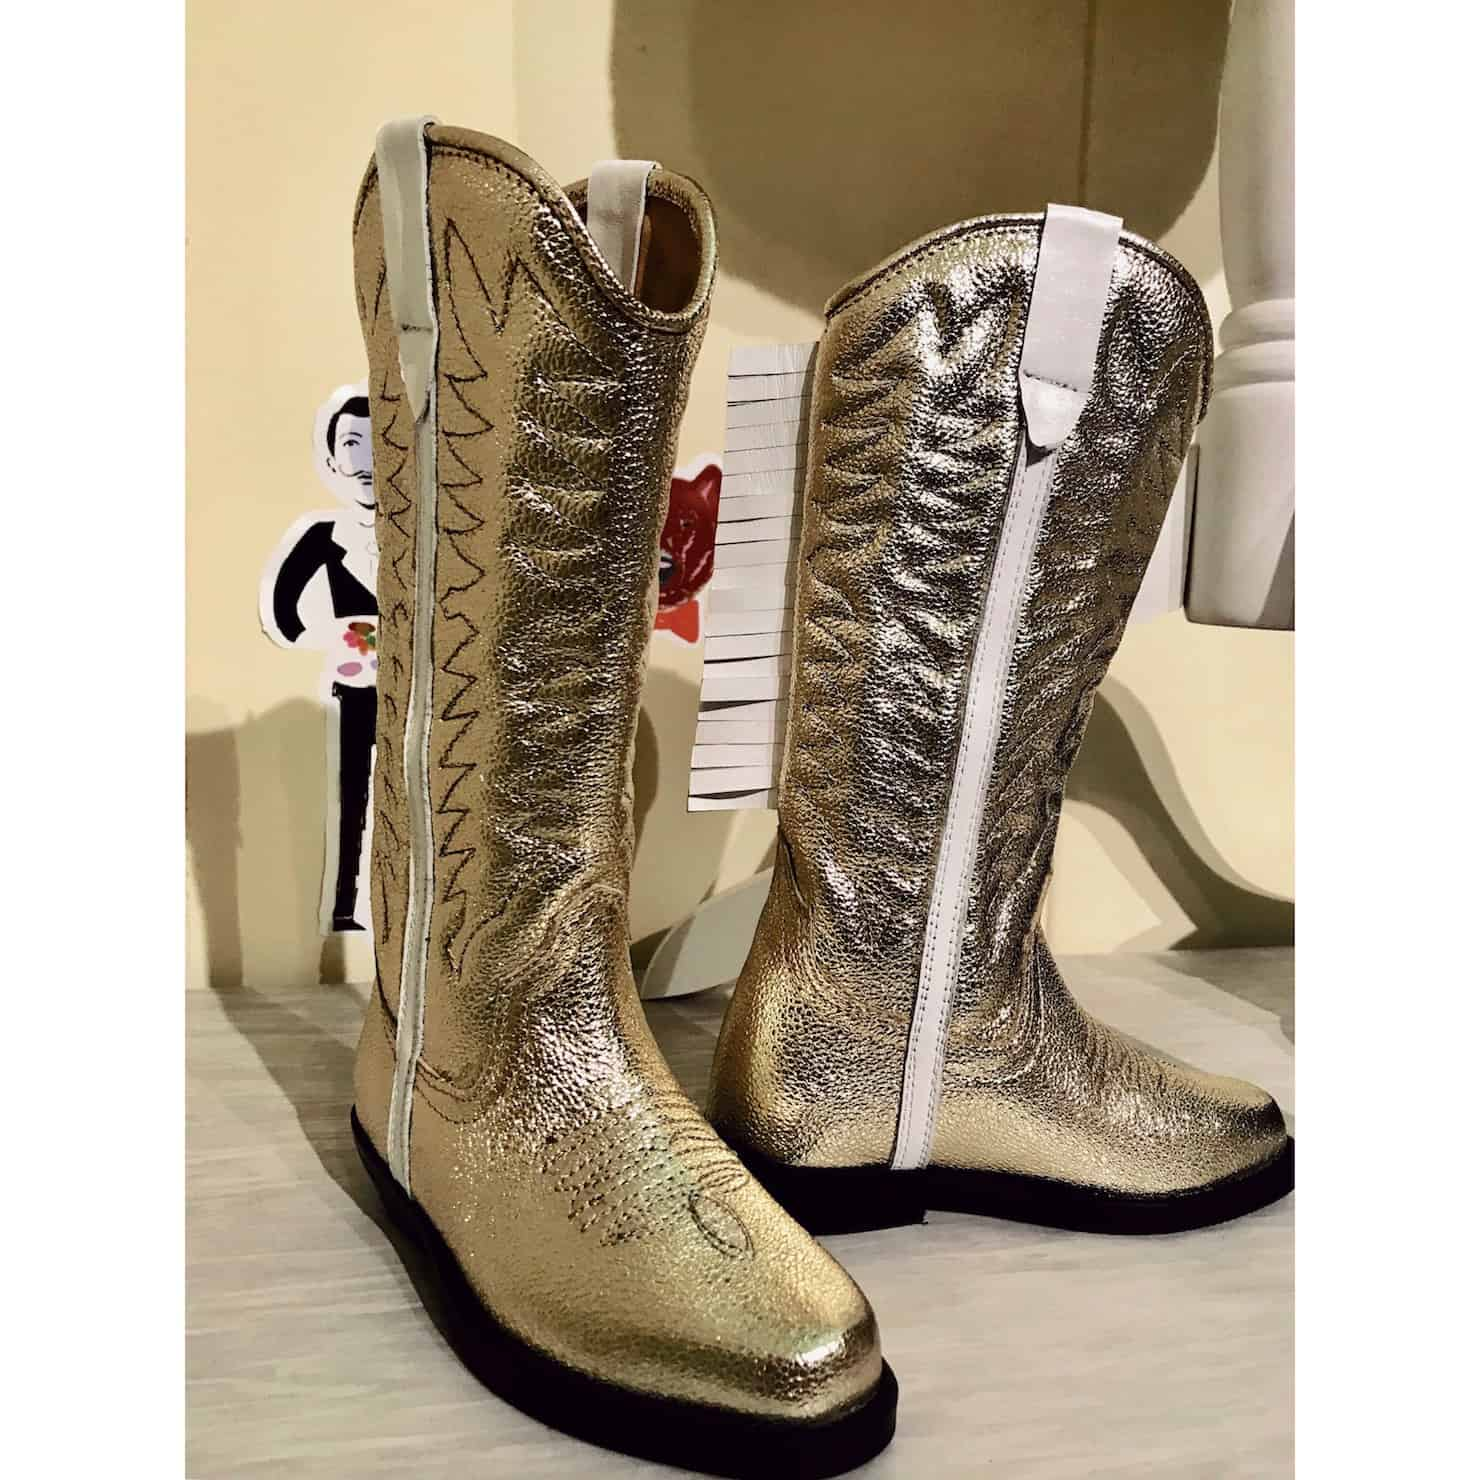 Pitti Bimbo 88 - metallic trends boots